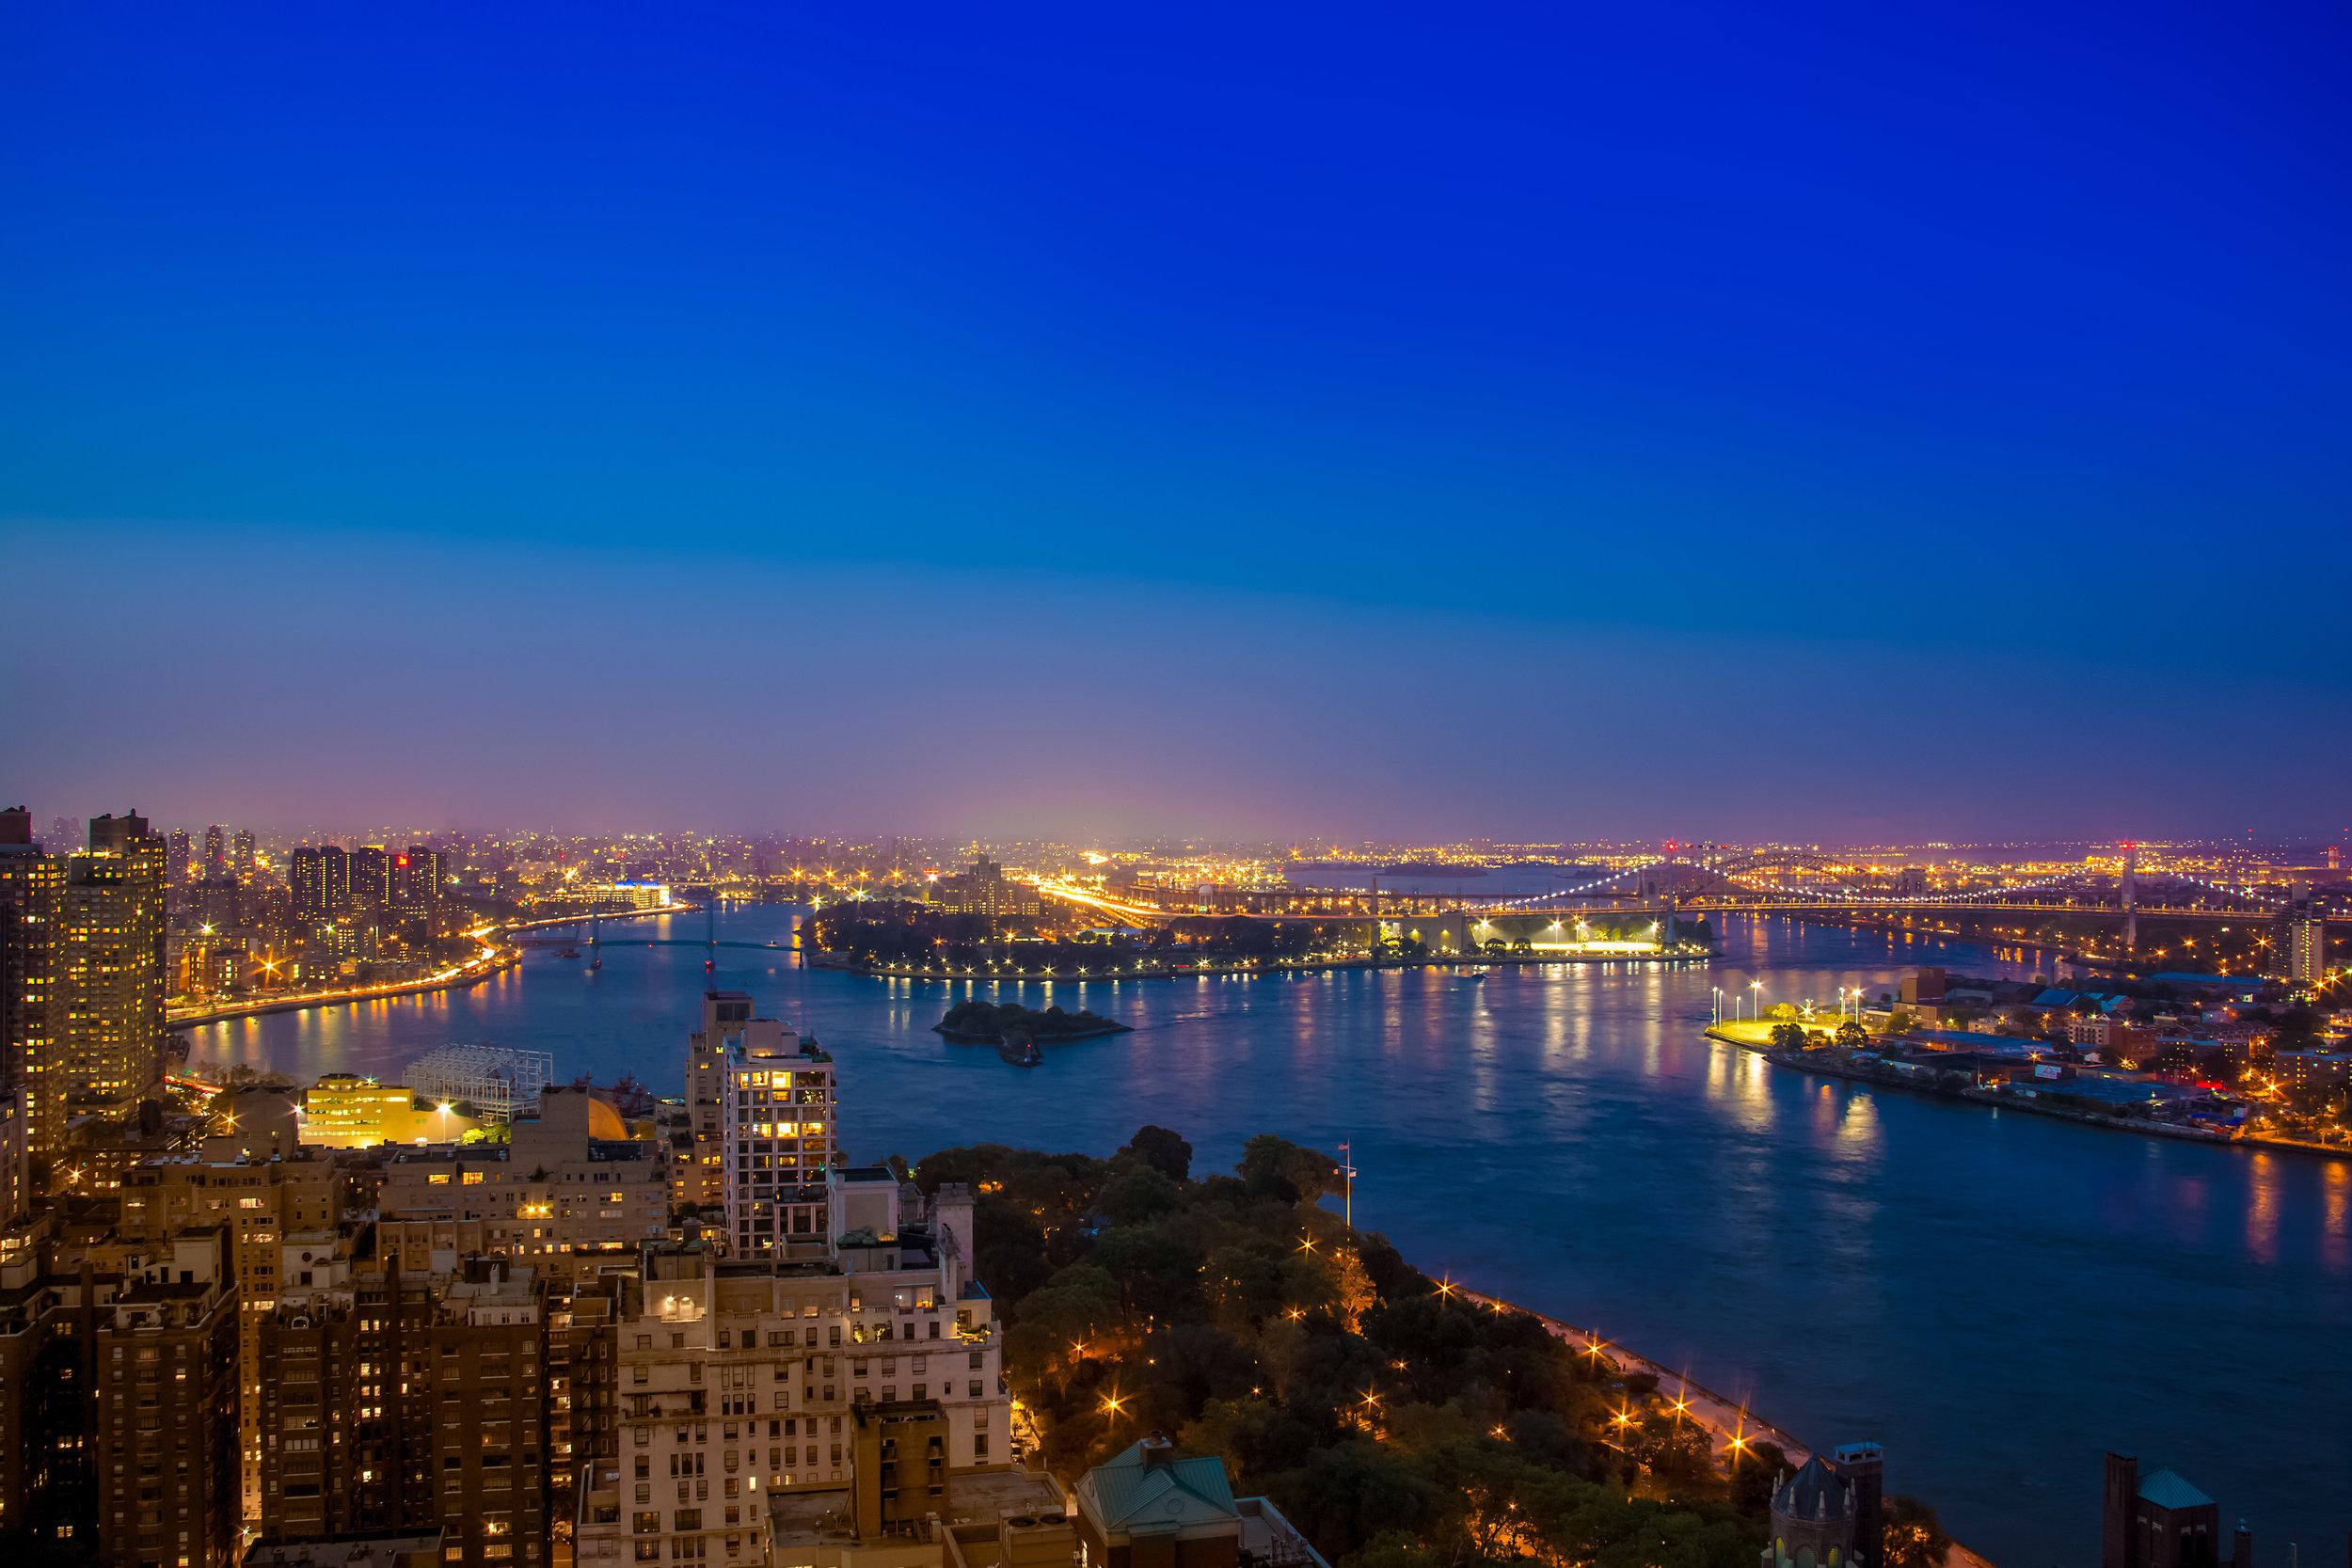 LSNY_Night_City_Views-8.jpg